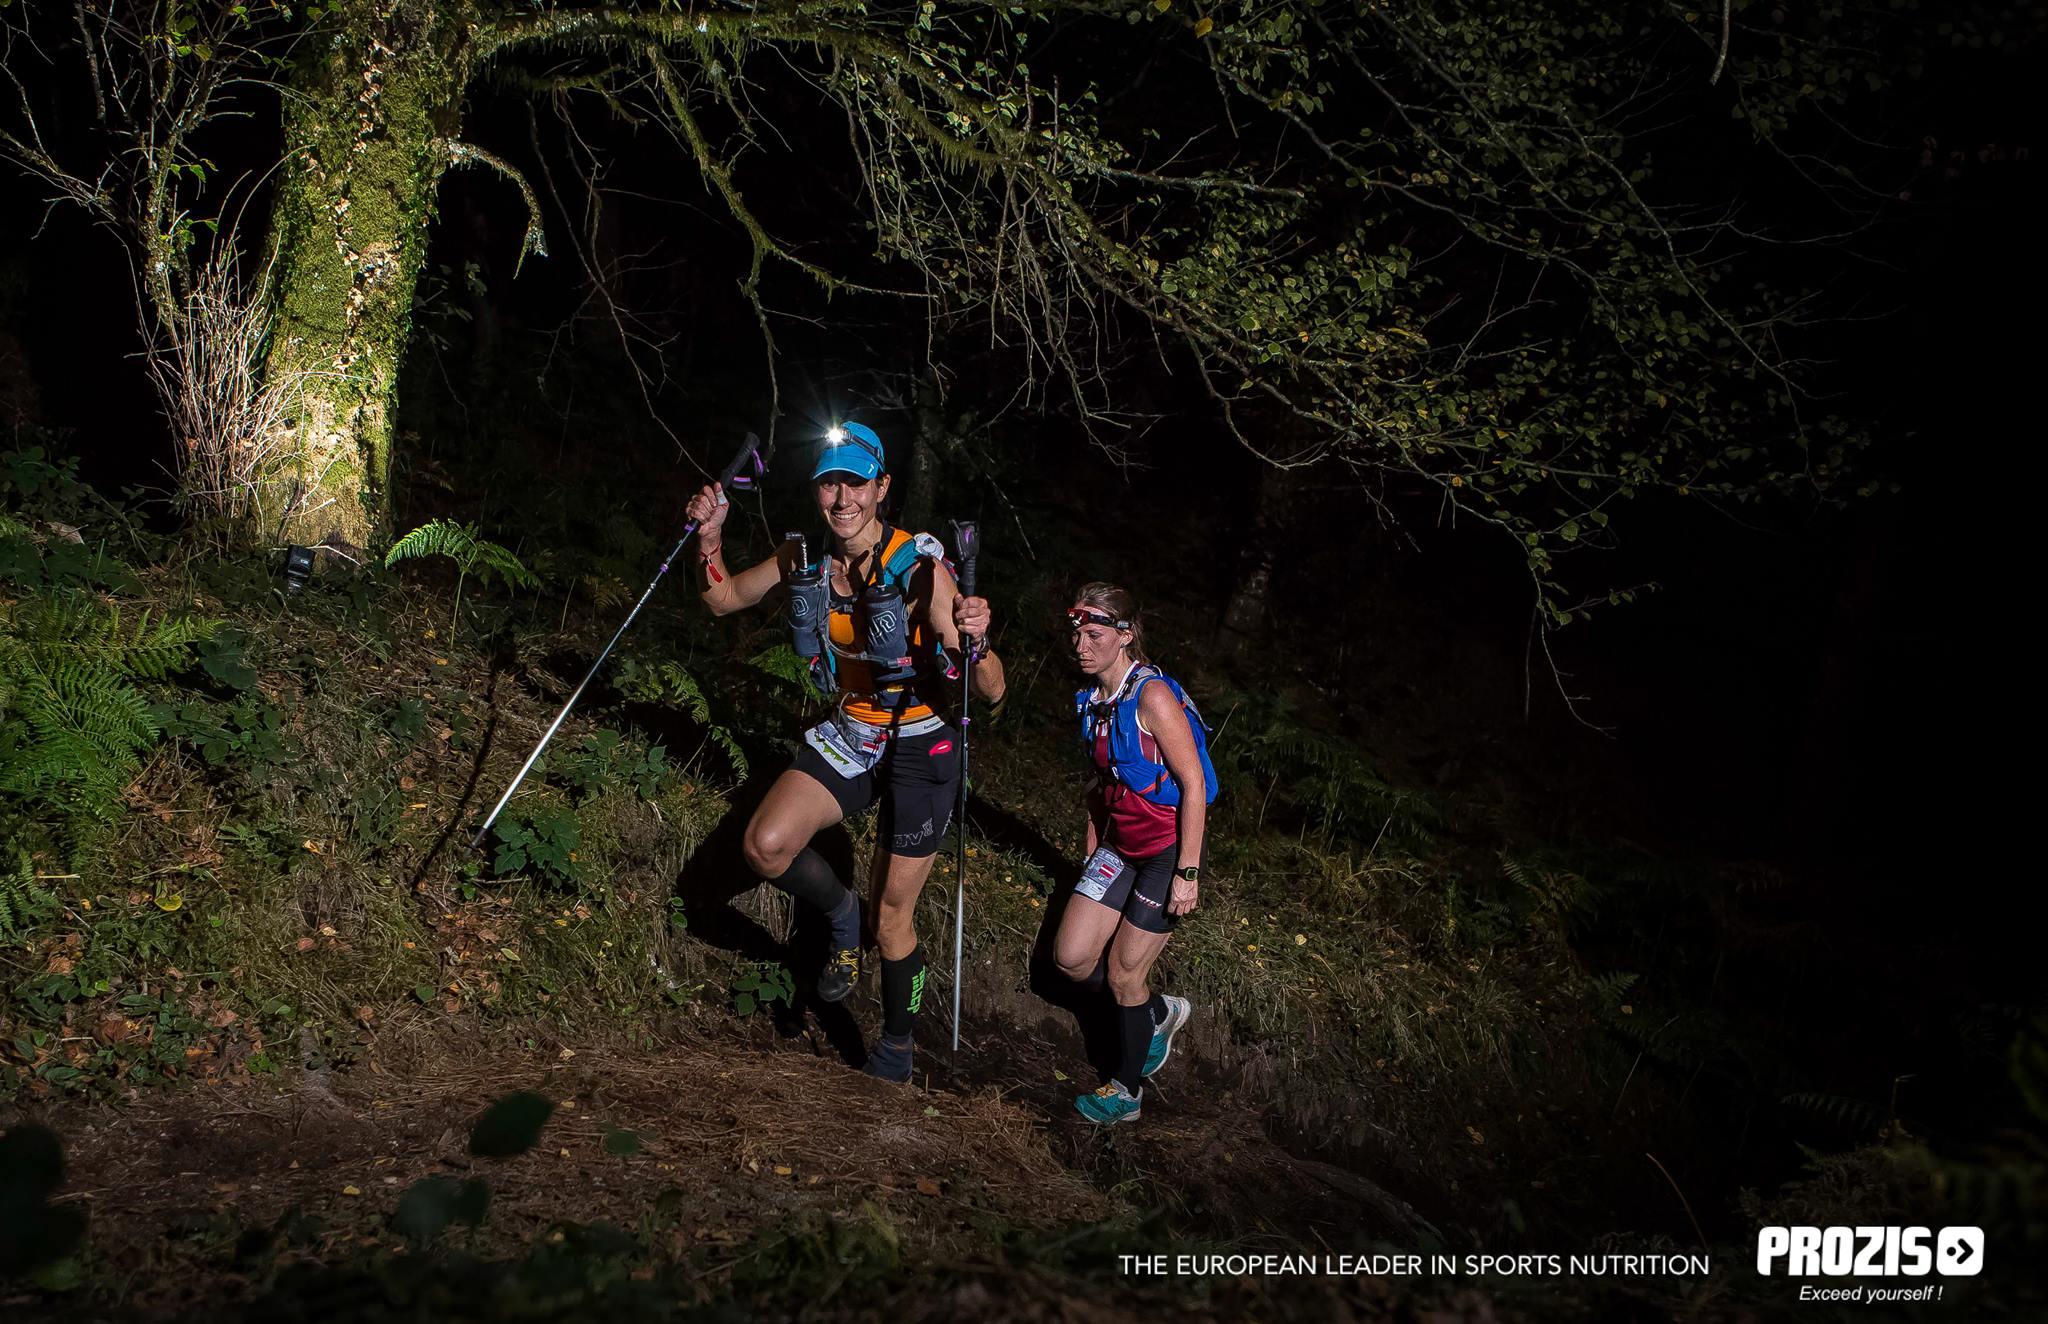 Janne Geurts Ultra Runner